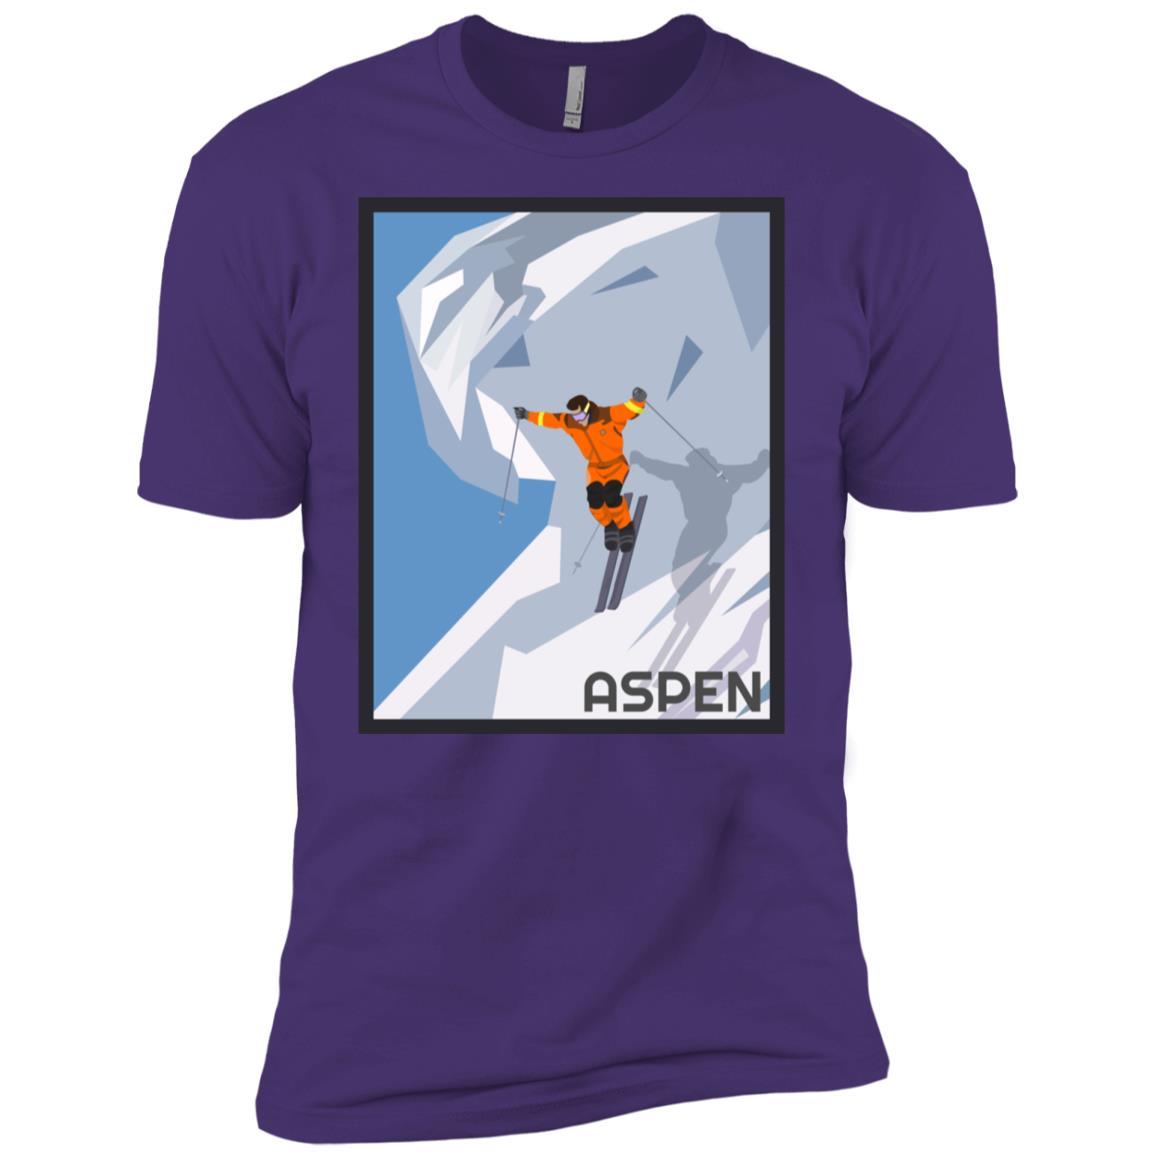 Aspen Colorado Vintage Skiing Poster Men Short Sleeve T-Shirt